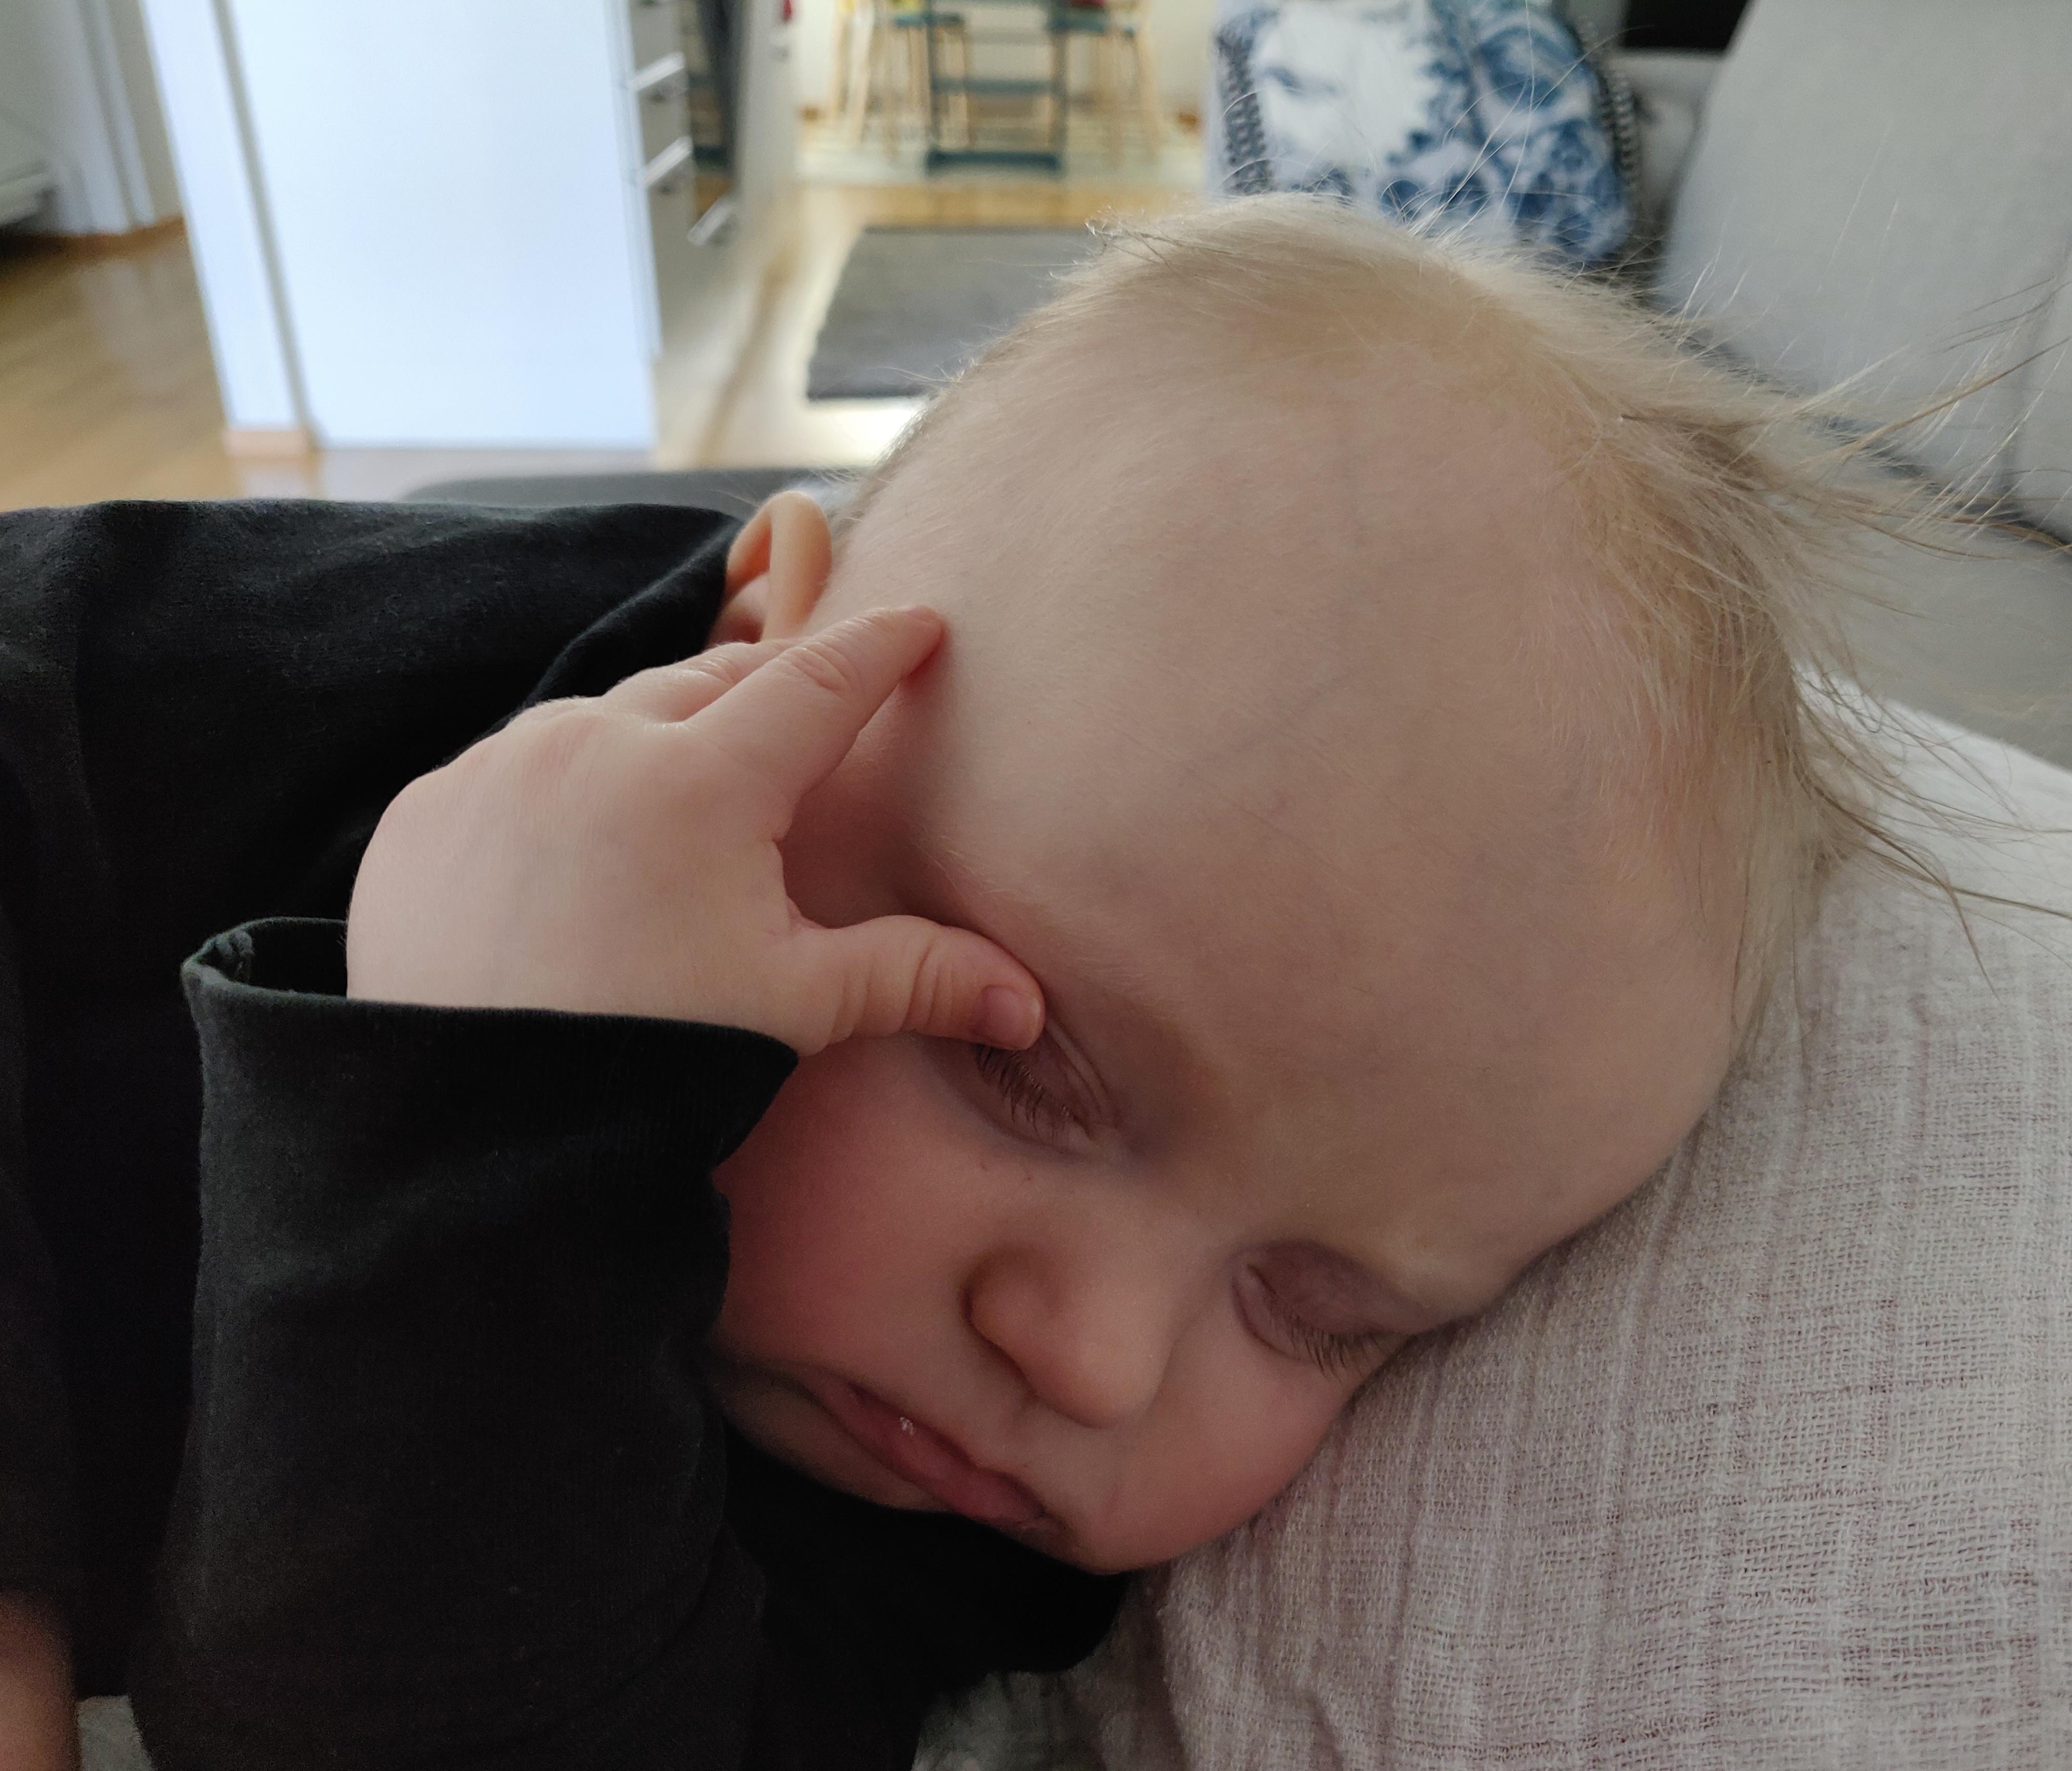 Vauva nukkuu, äiti ei